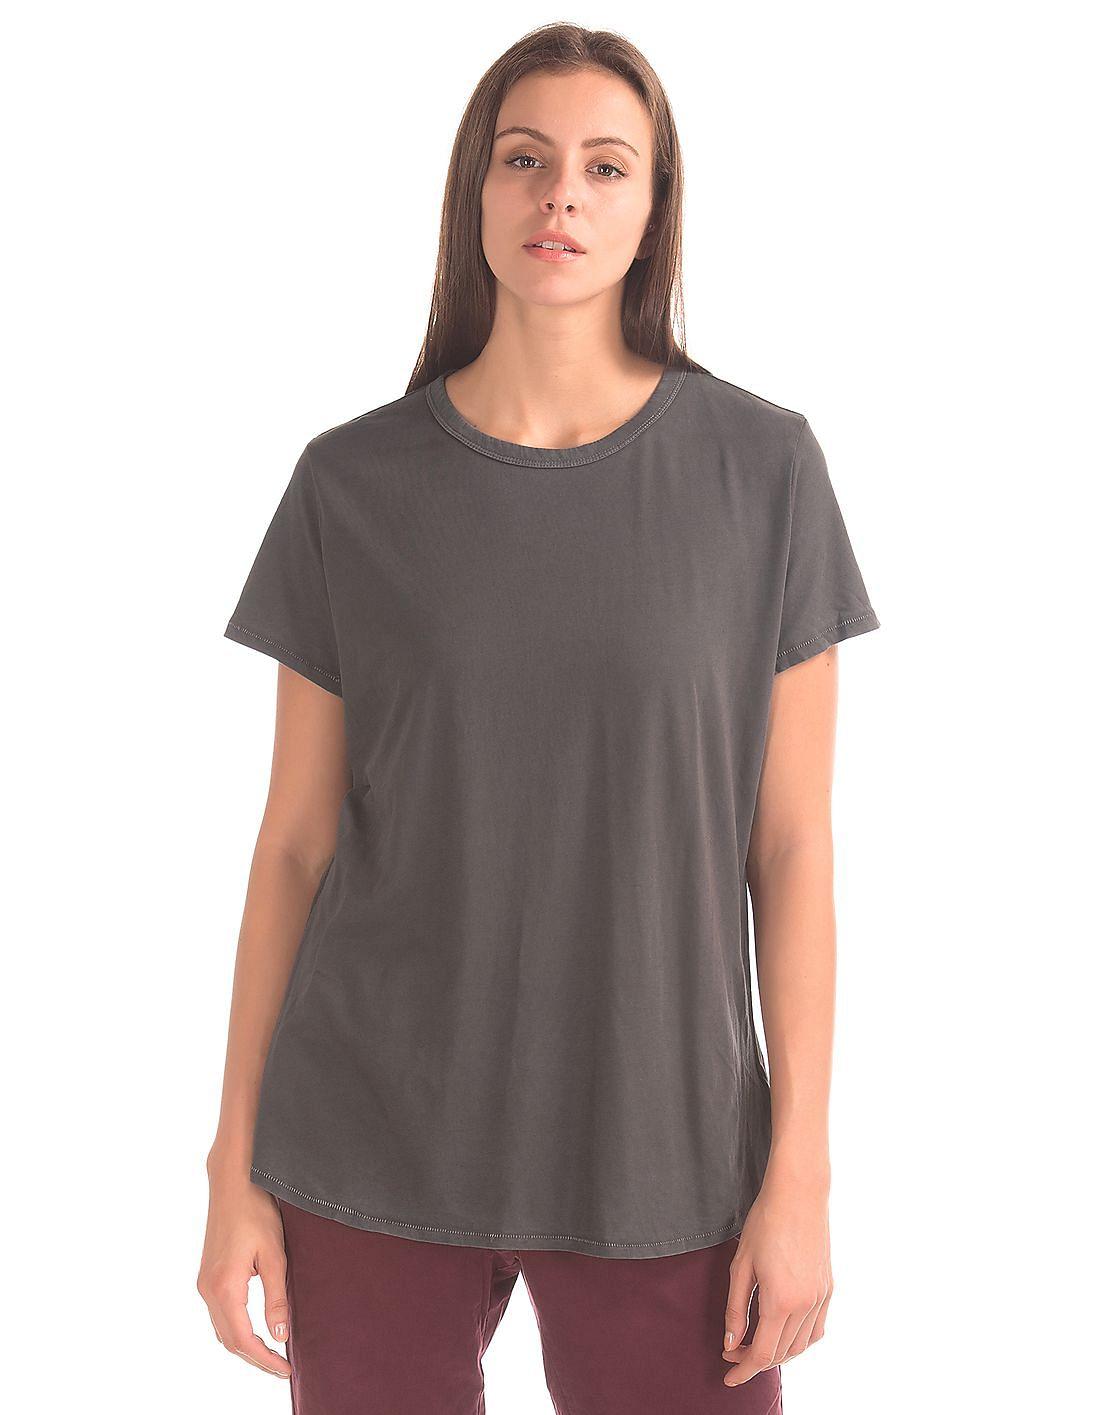 d506e58e Buy Women Vintage Wash Crew Neck tee online at NNNOW.com